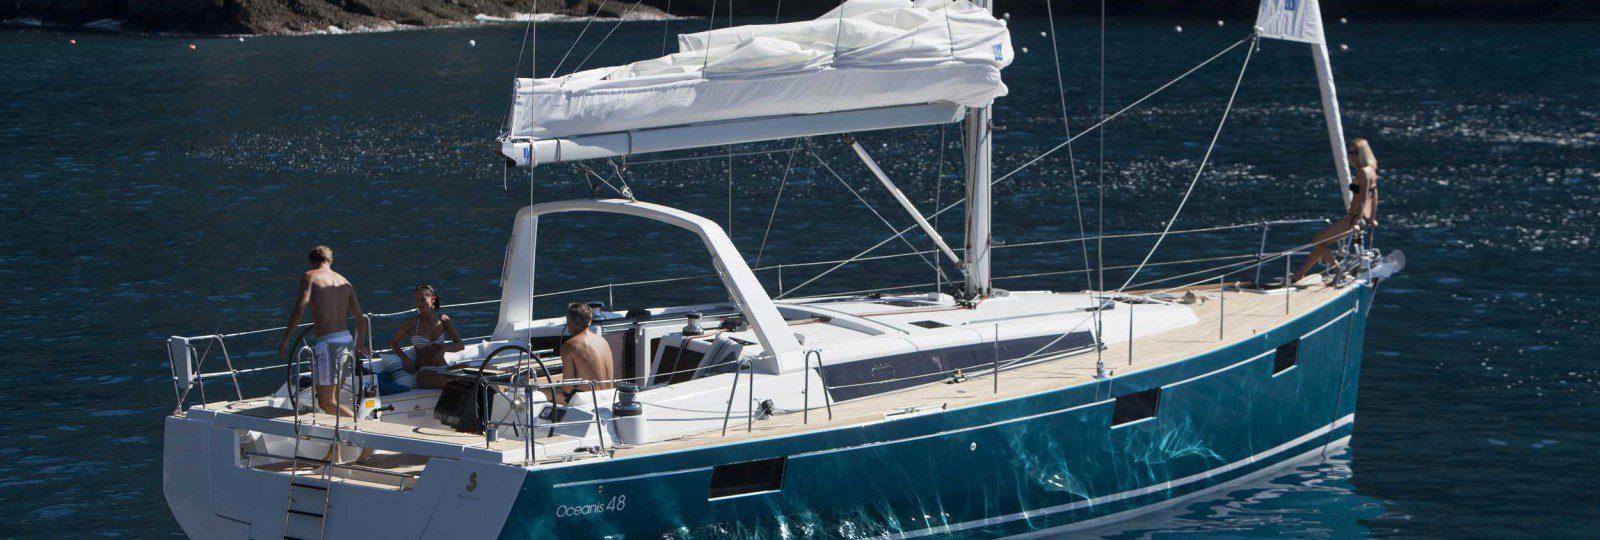 Beneteau Oceanis 48 at anchor